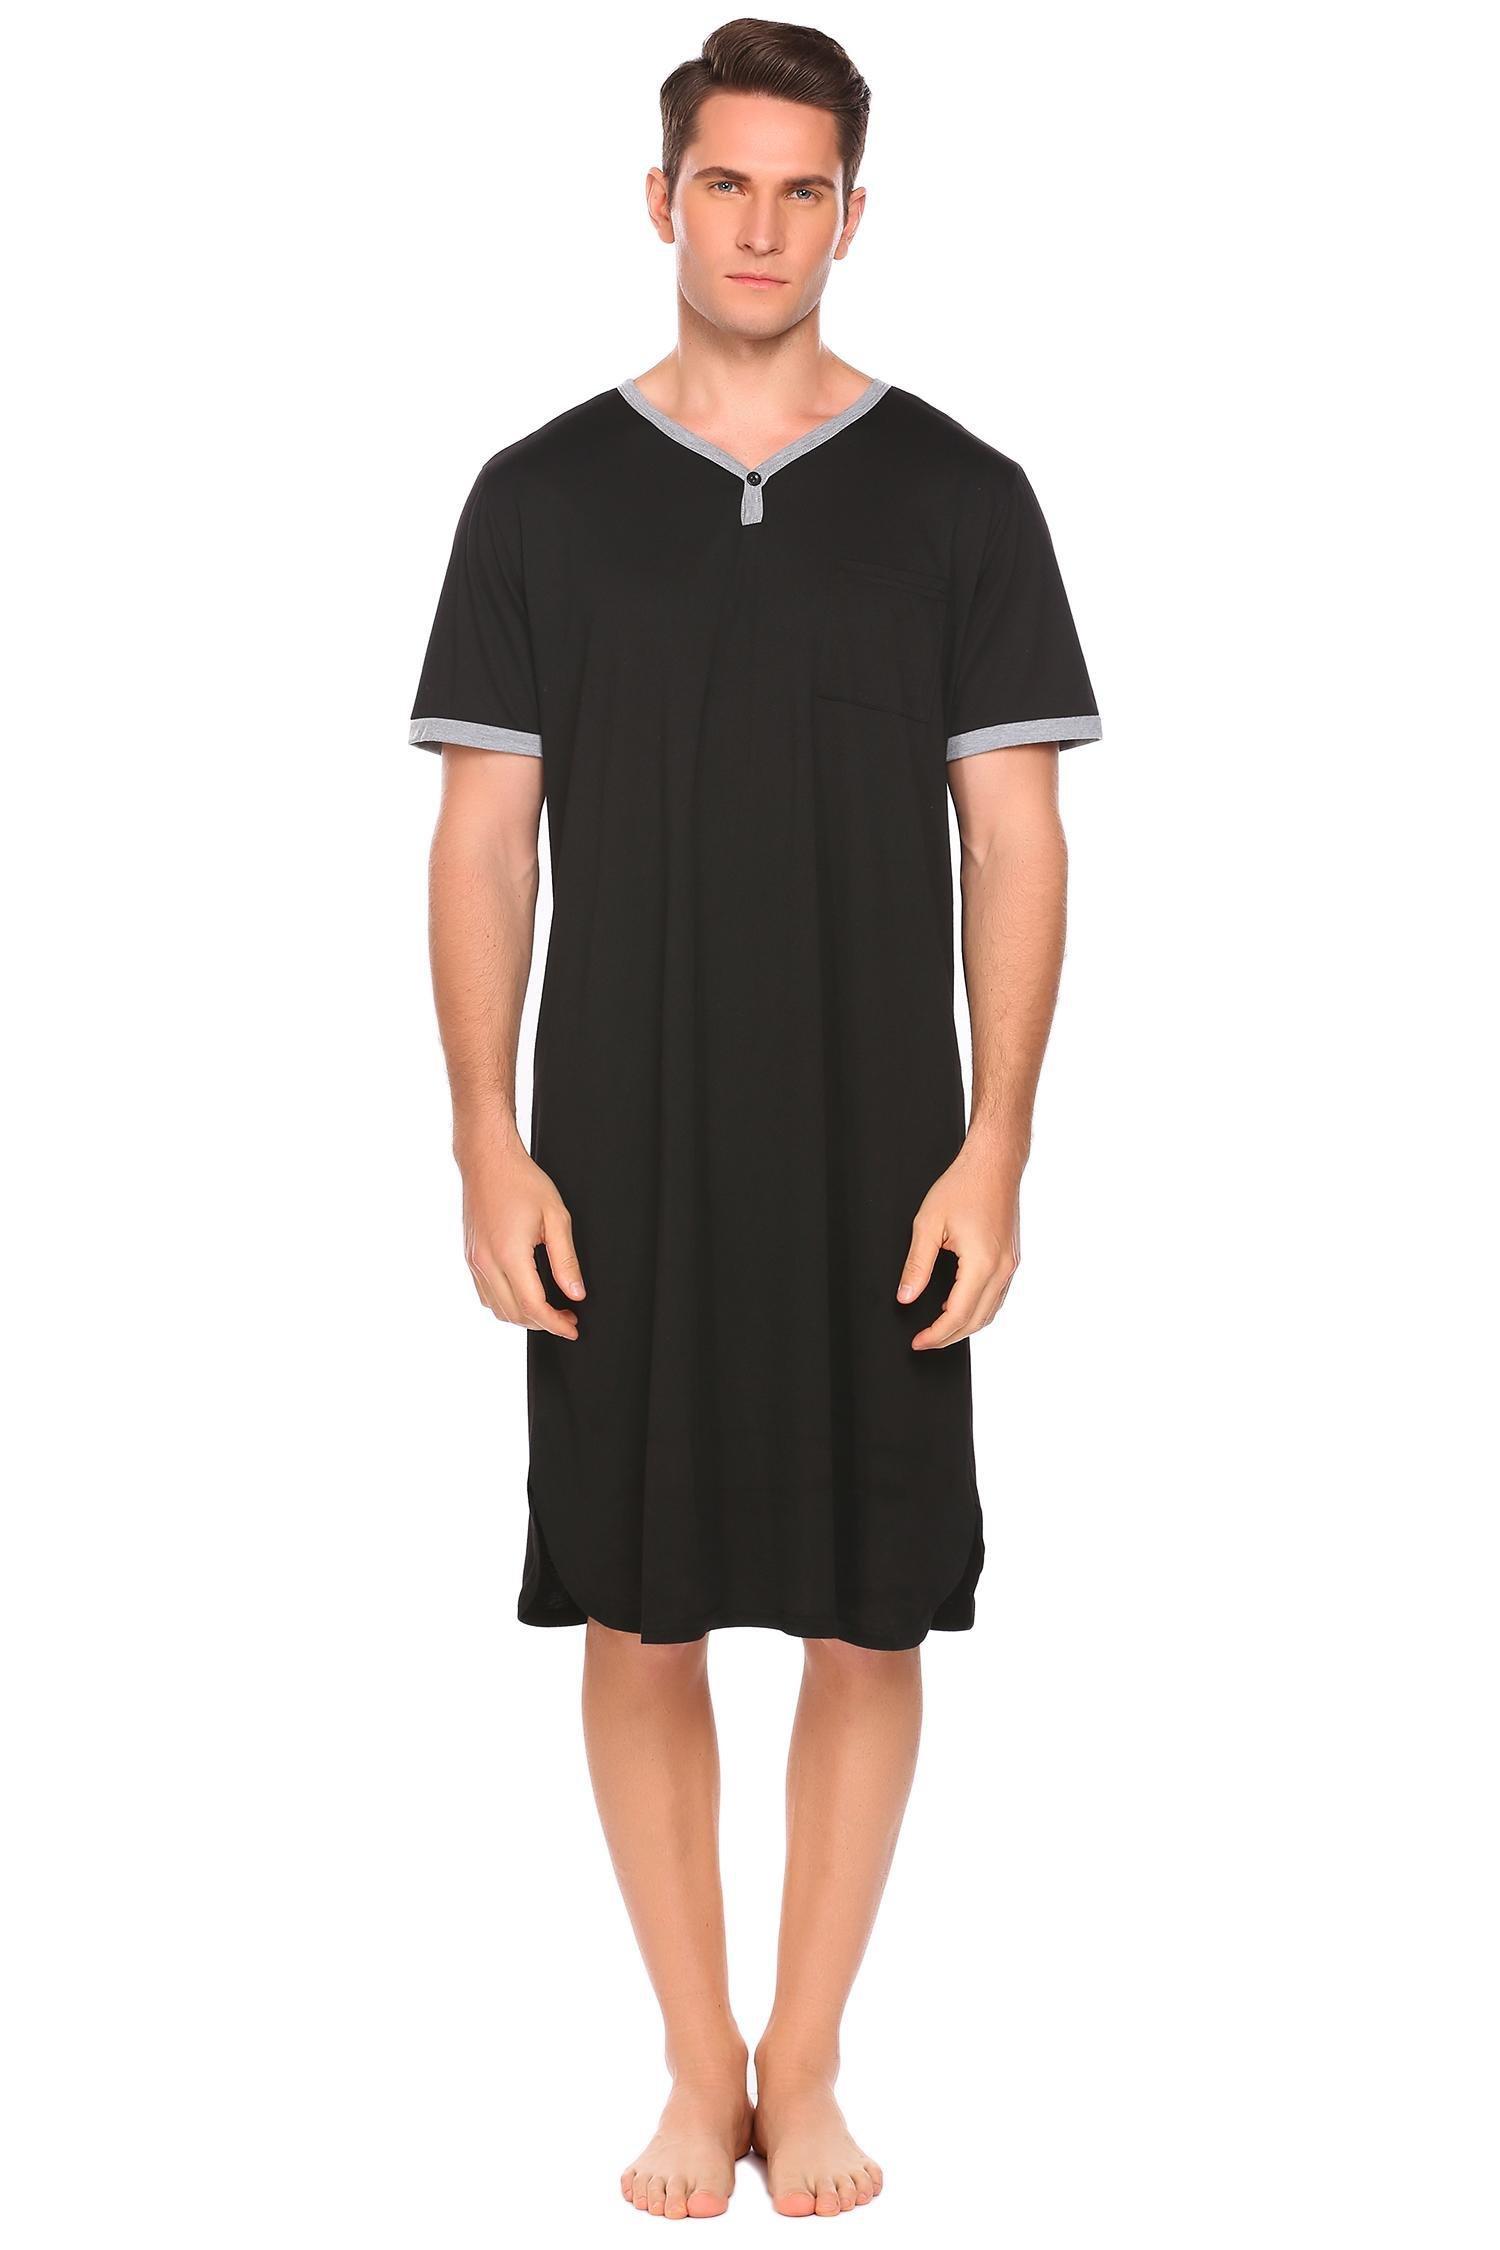 Pagacat Men's Nightshirt Cotton Nightwear Comfy Big&Tall Short Sleeve Sleep Shirt(Black,Medium)